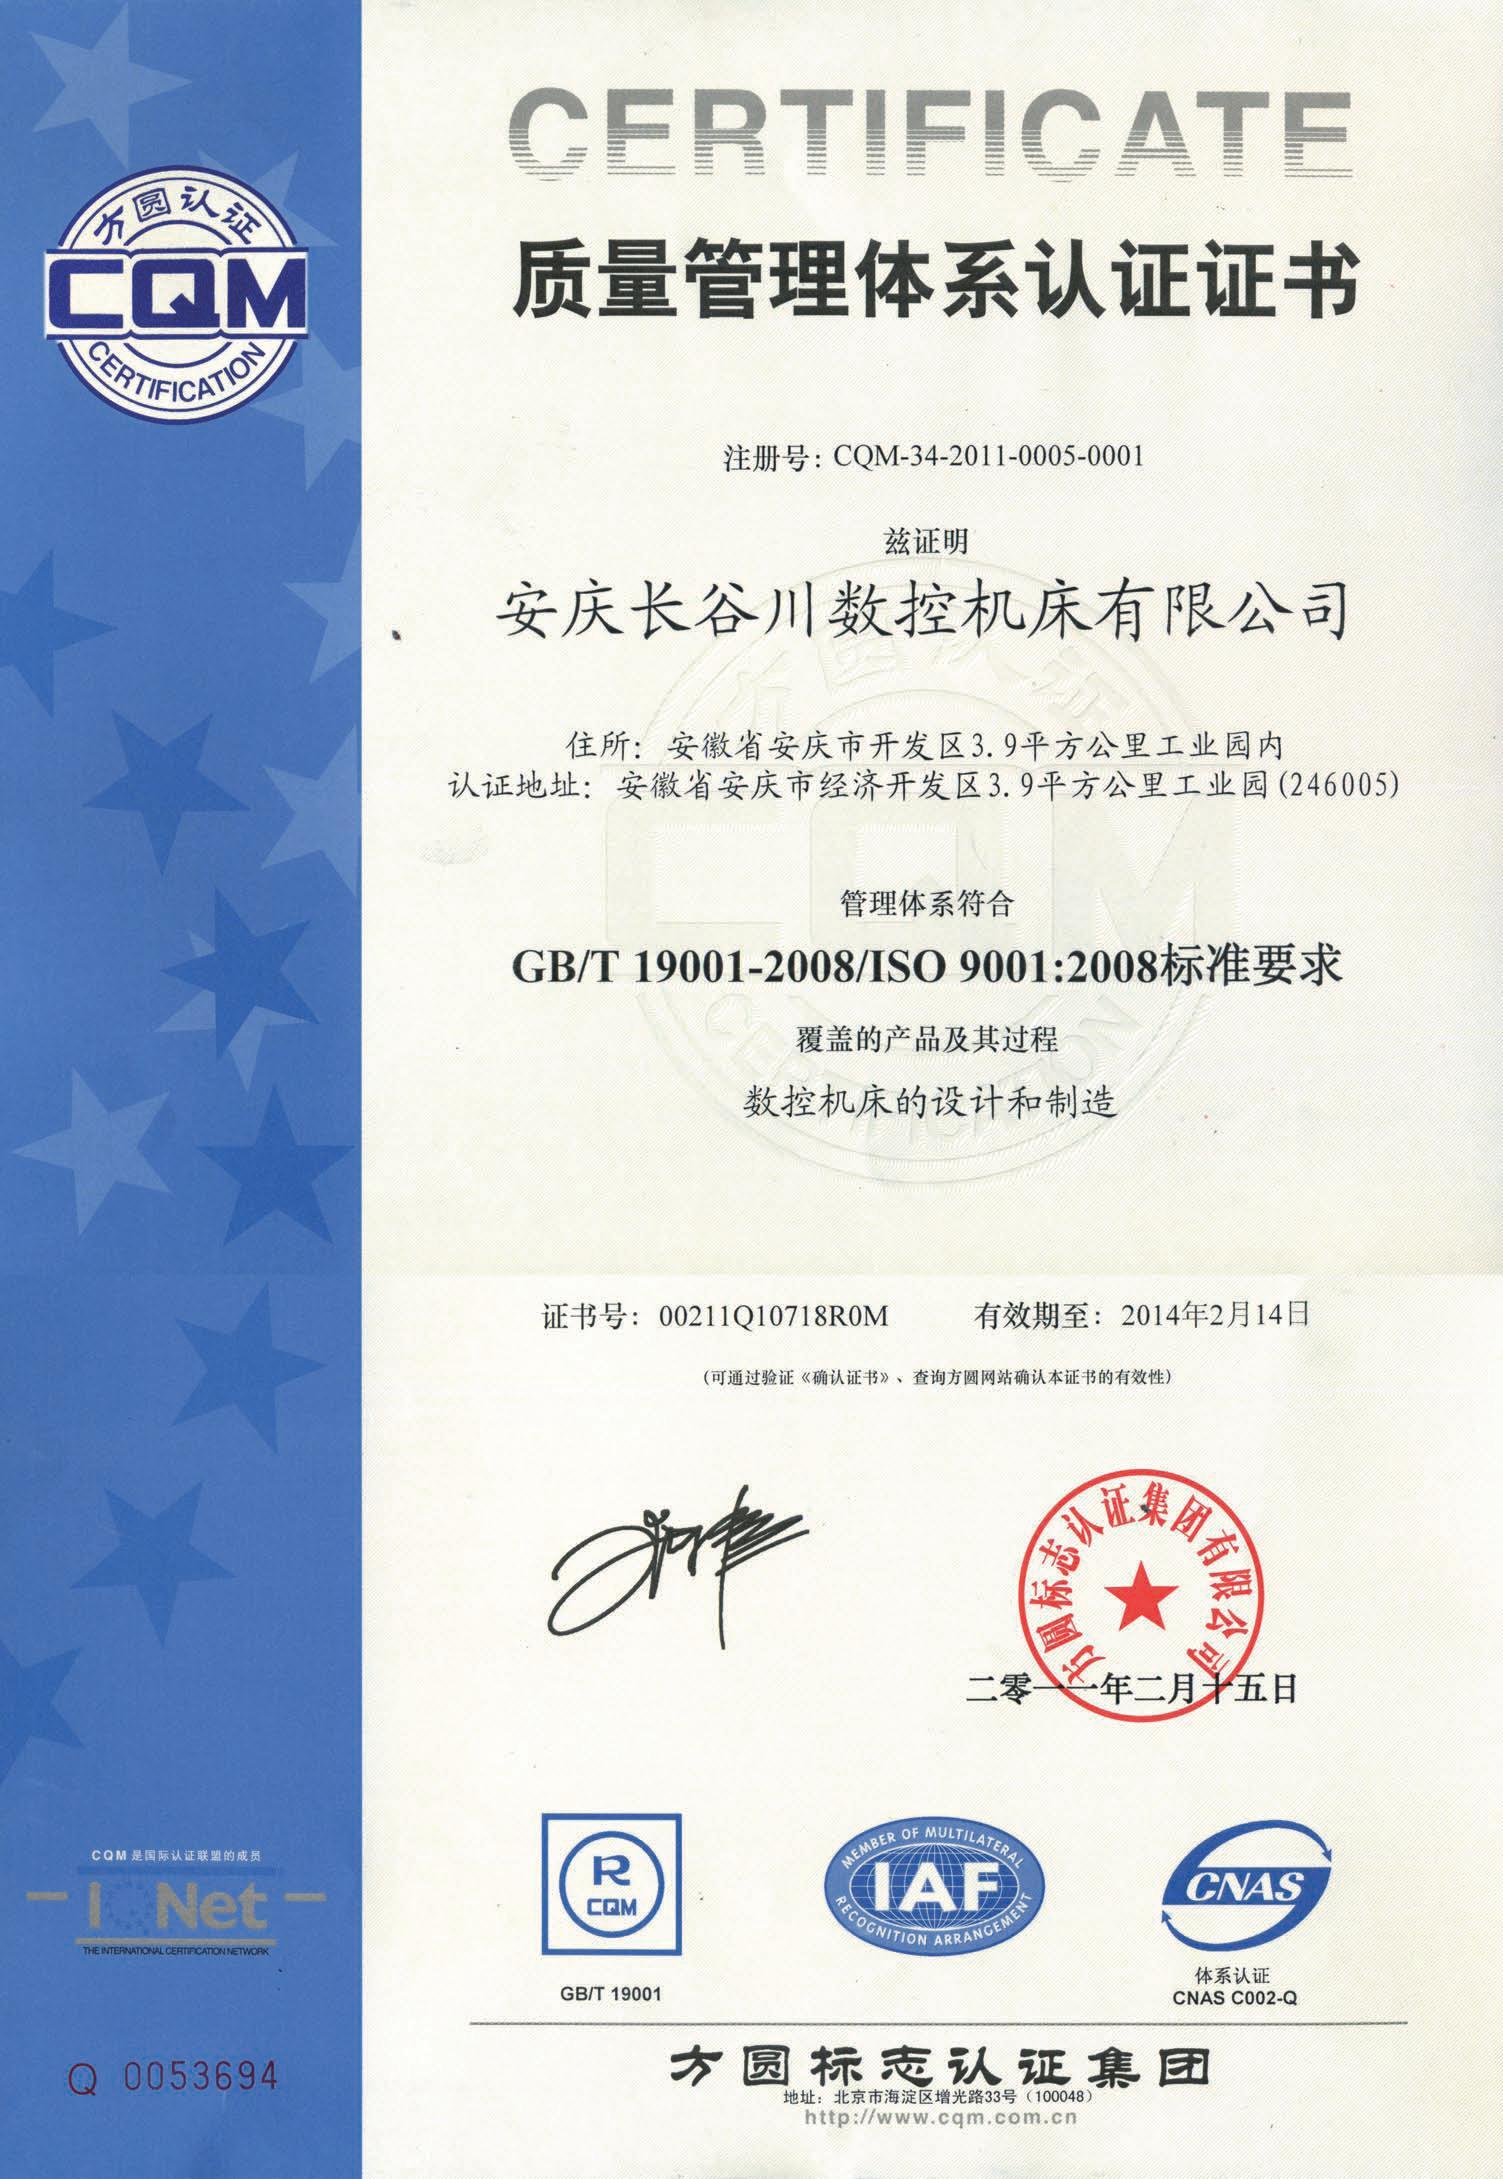 ISO9001品質システム証書(CNC)